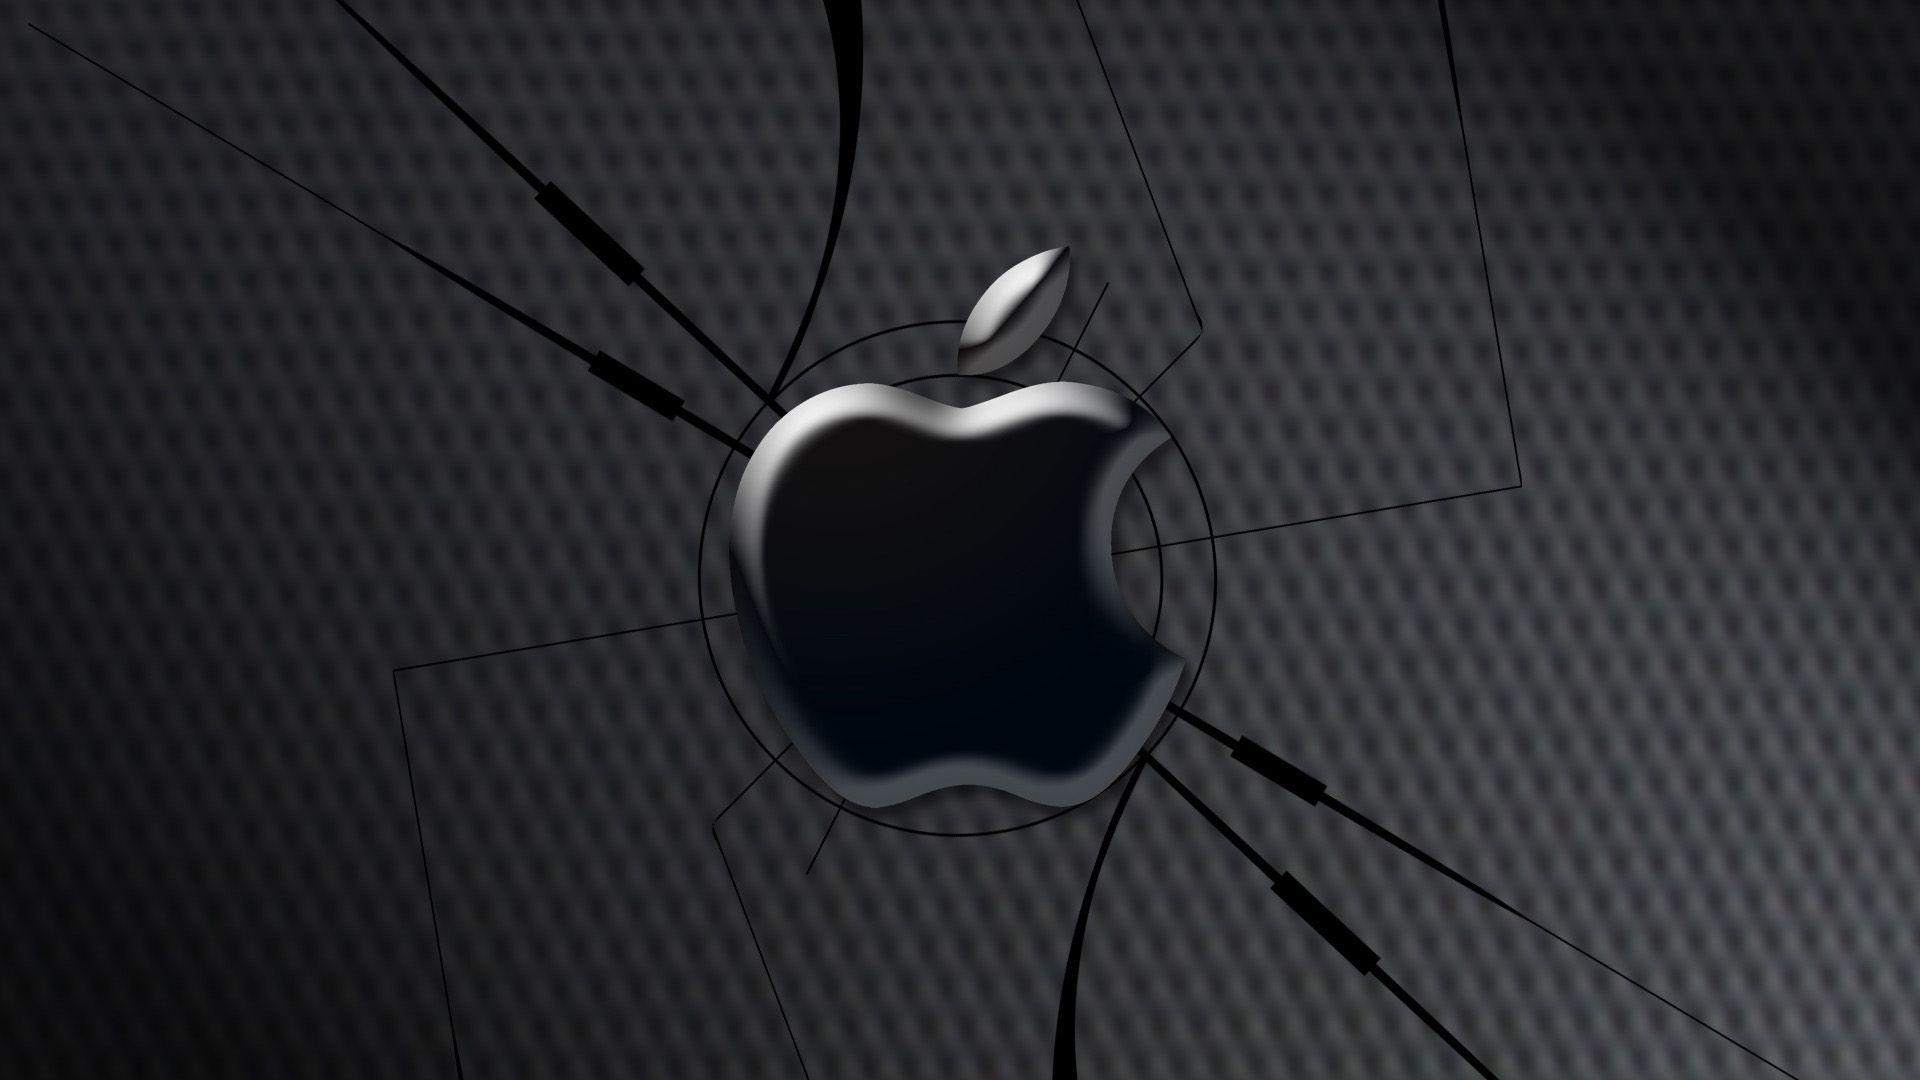 Nice Apple Jabuka Wallpaper HD Pozadine